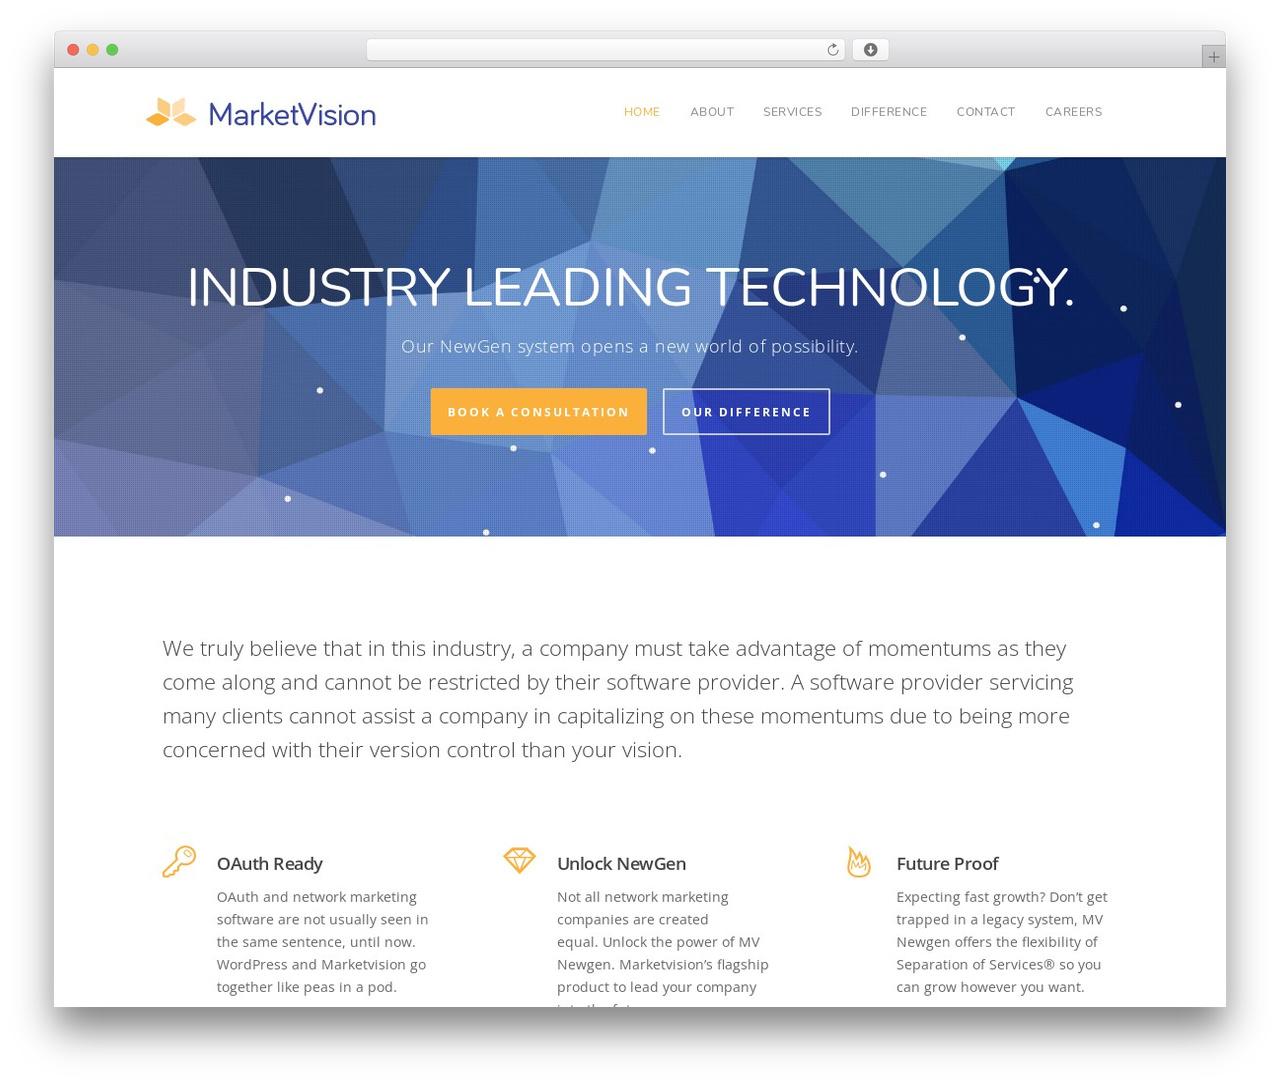 WP theme Salient - marketvision.com